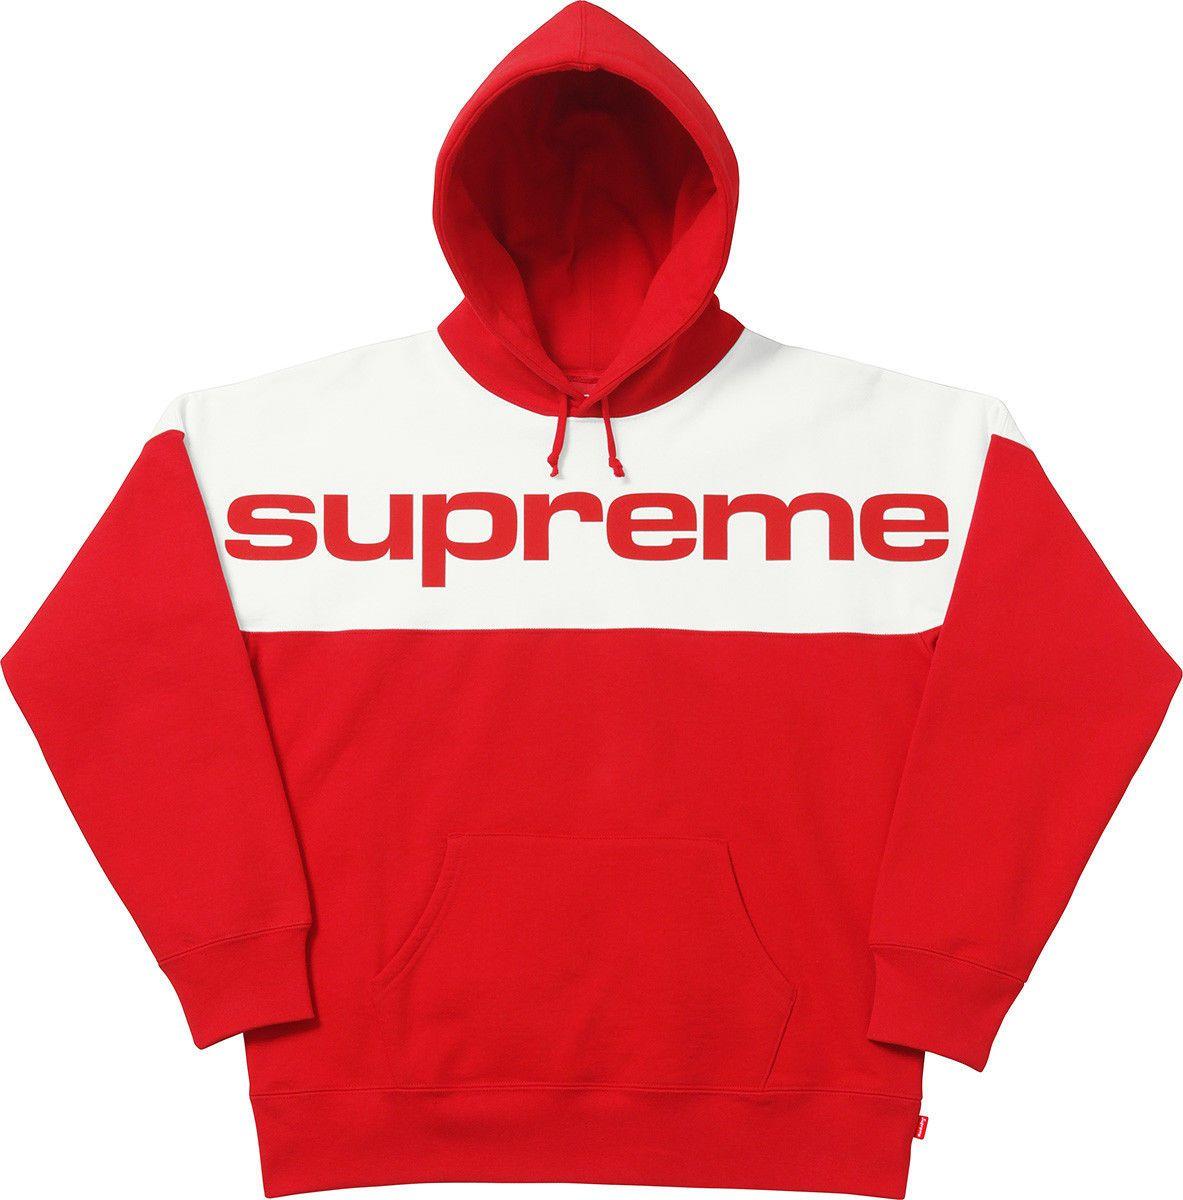 851e74c79195 Top quality 2017 Unisex Supreme 17FW Blocked Hooded Sweatshirt cotton Big  letter